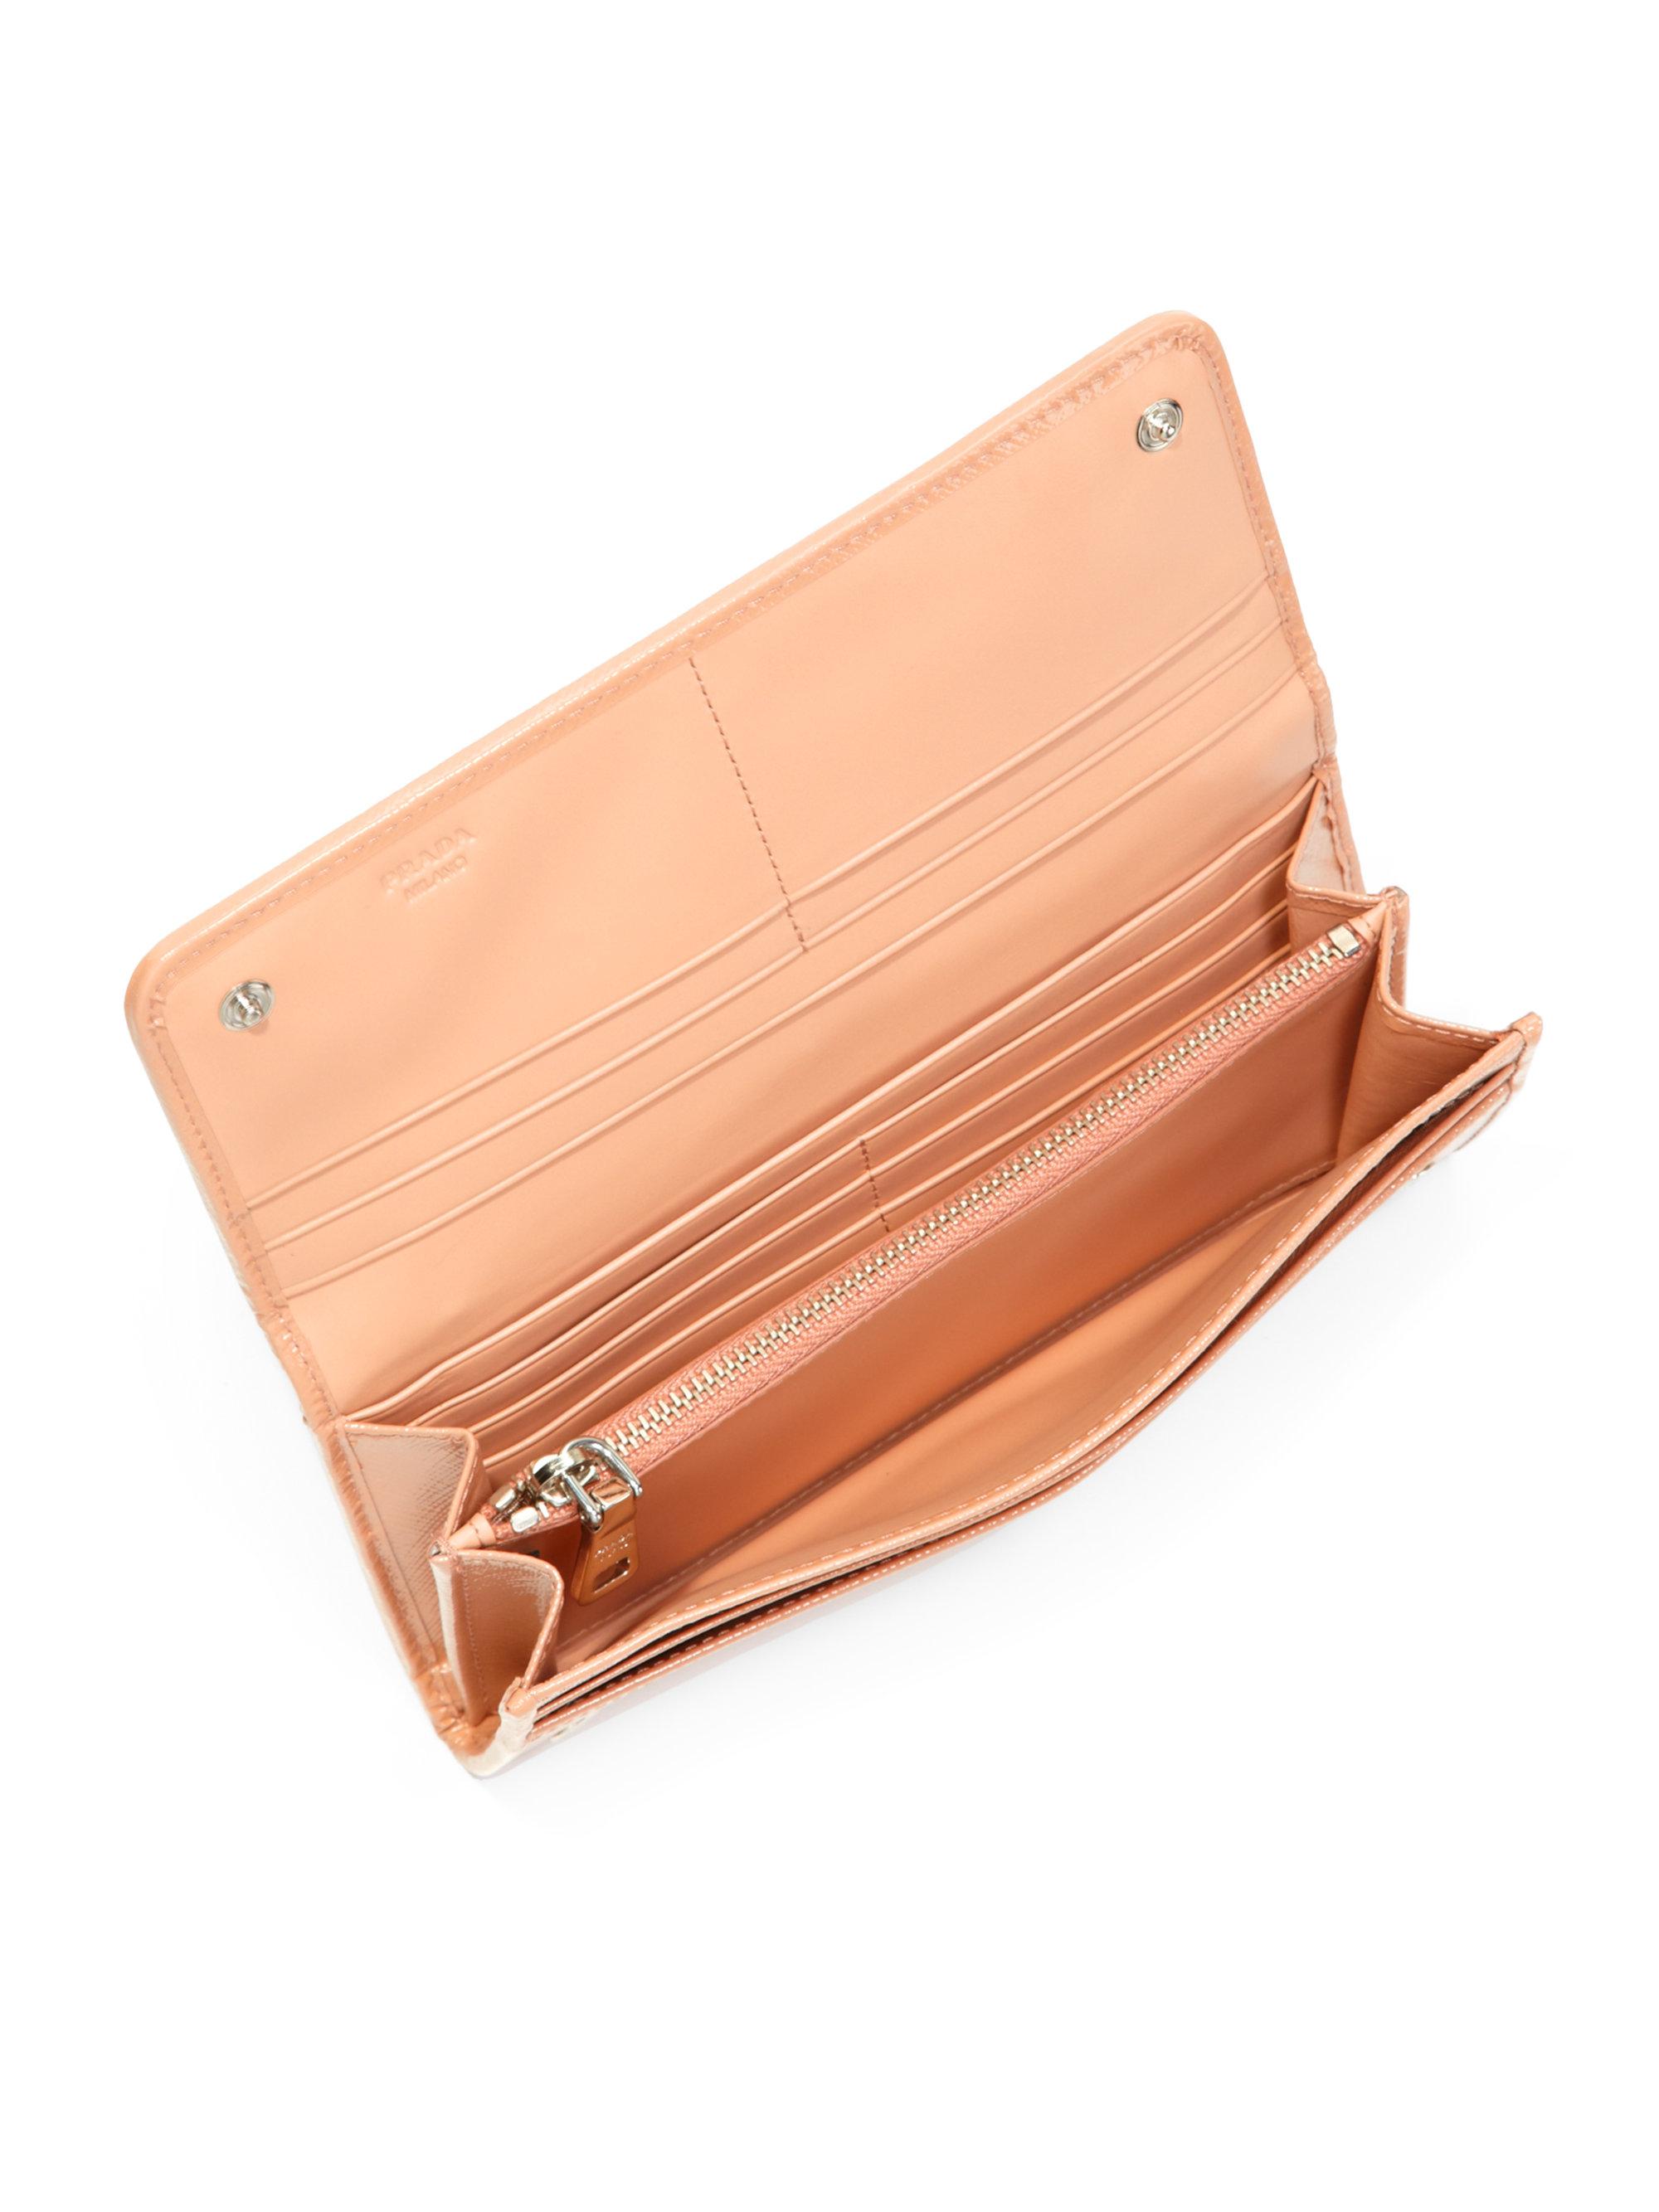 Prada Saffiano Studded Flap Wallet in Beige (CAMEL) | Lyst